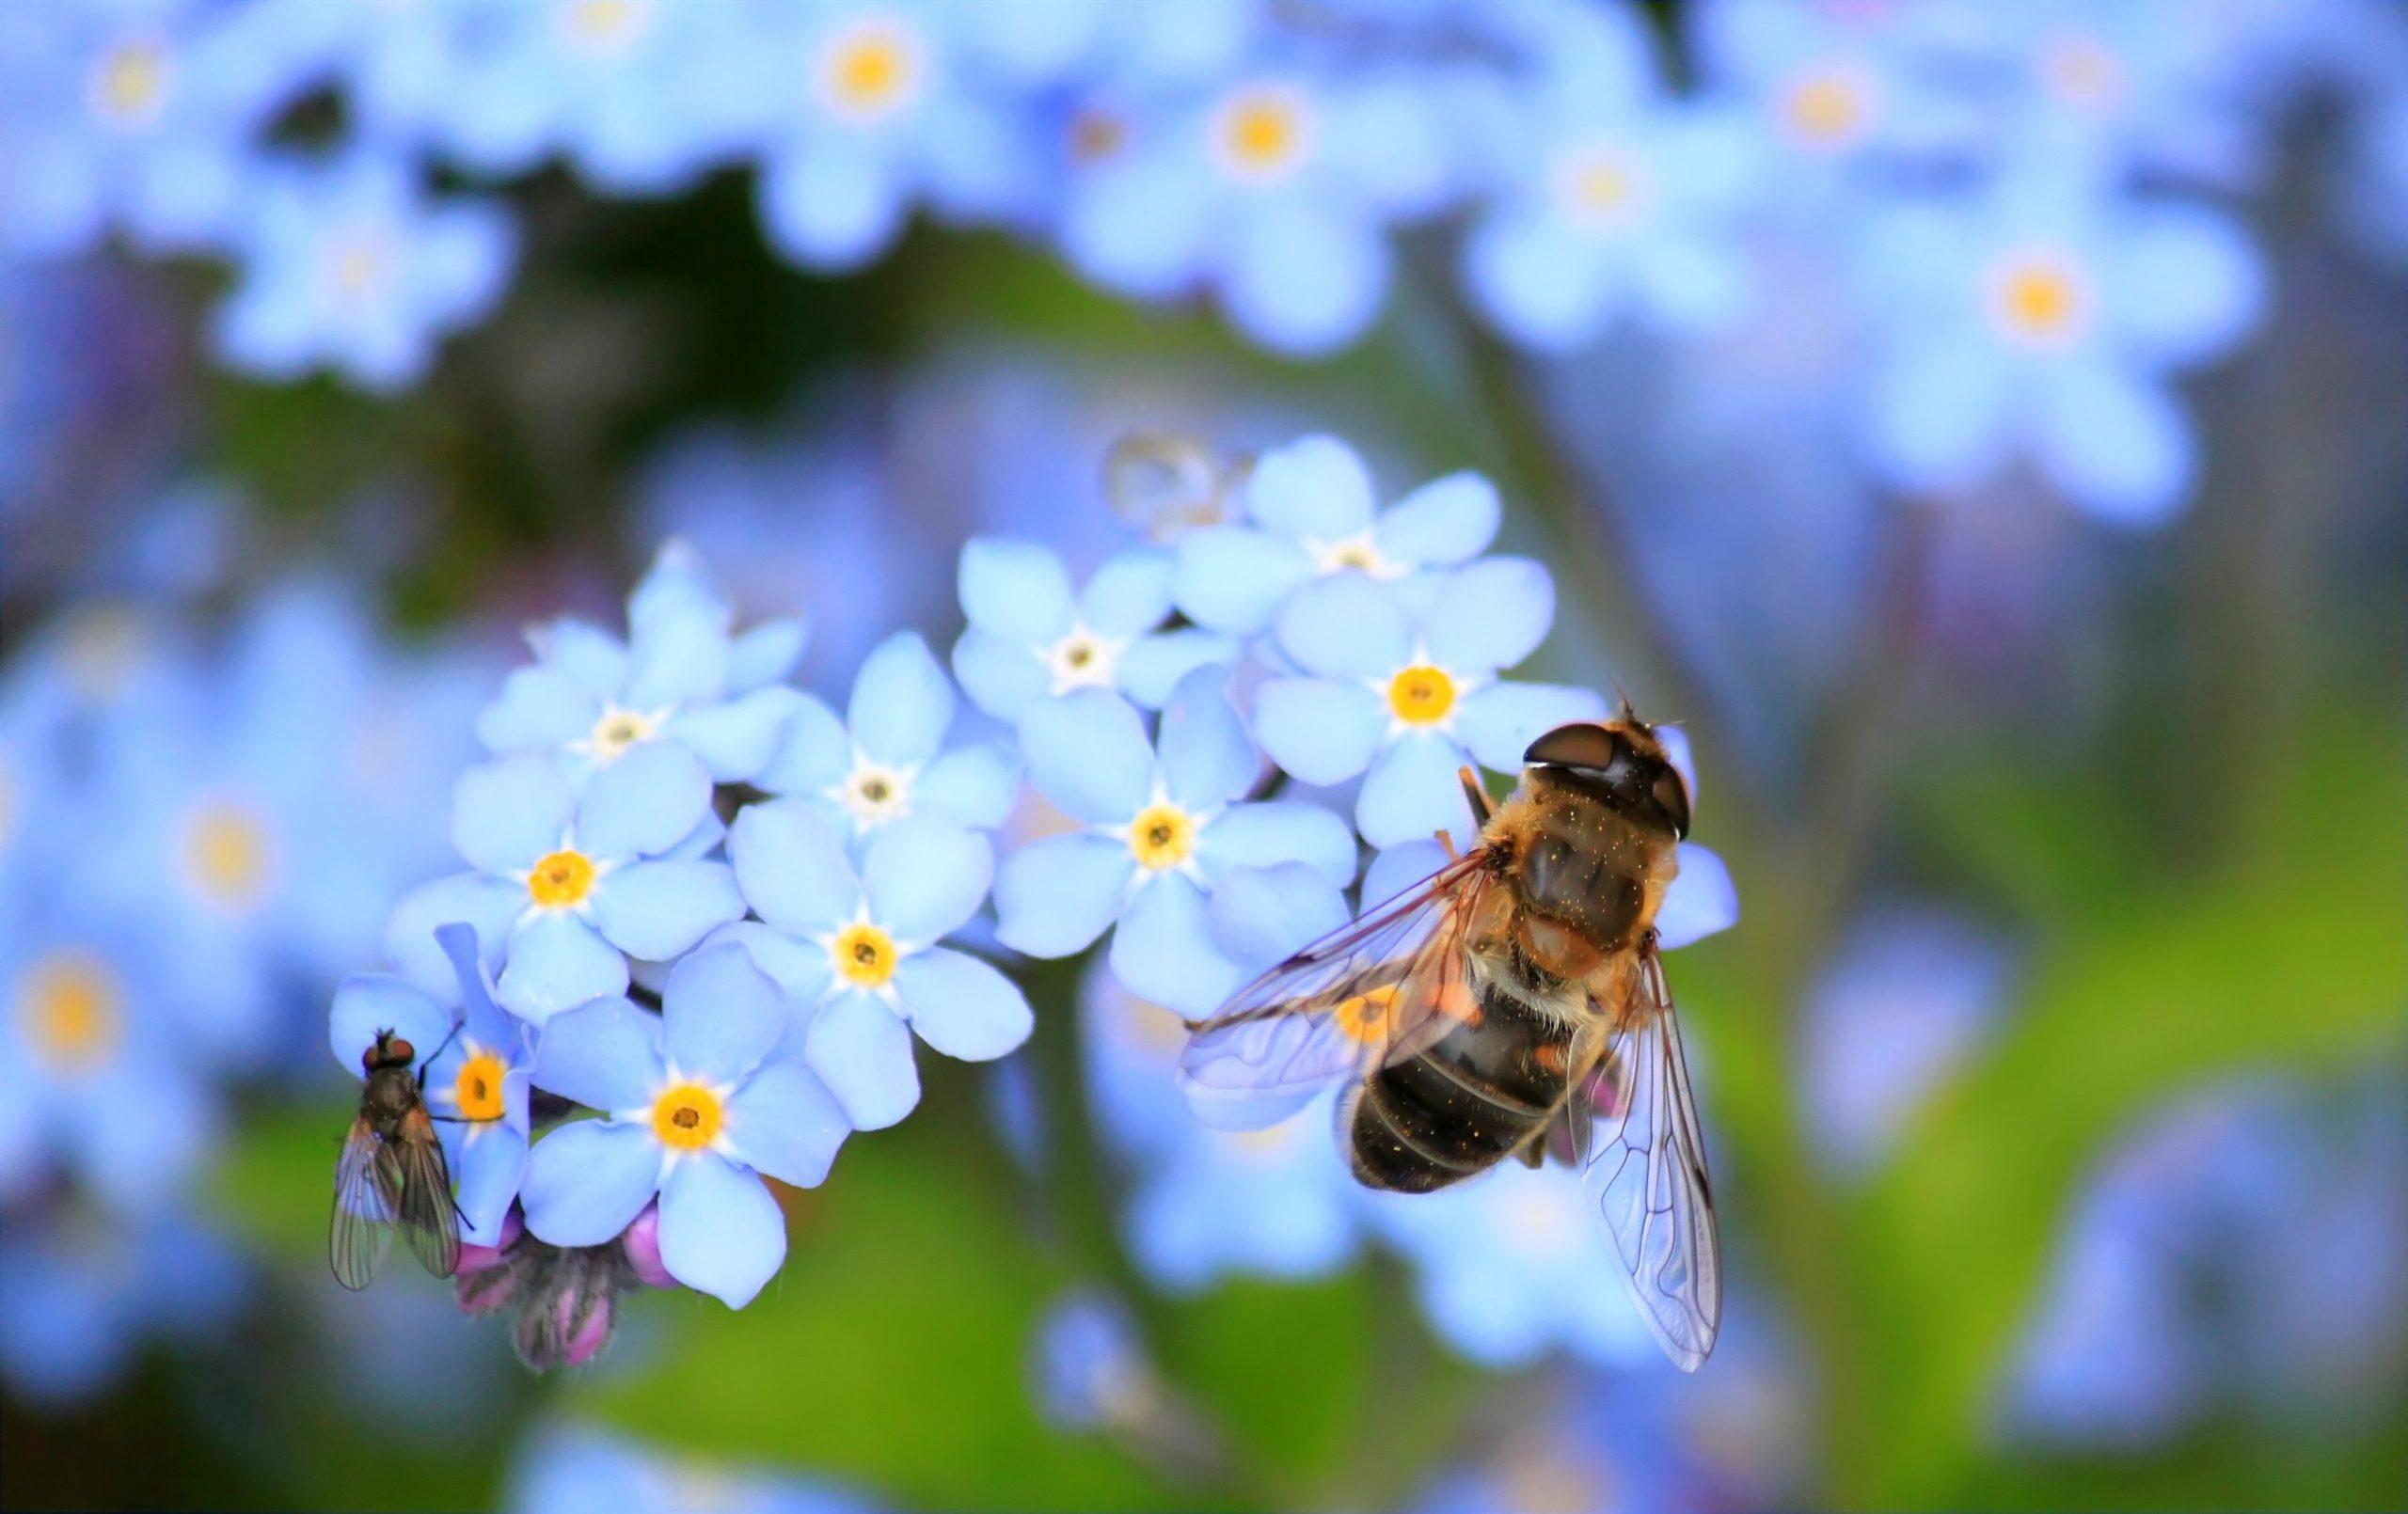 Internationaler Tag der Biene, Jagdfakten.at informiert